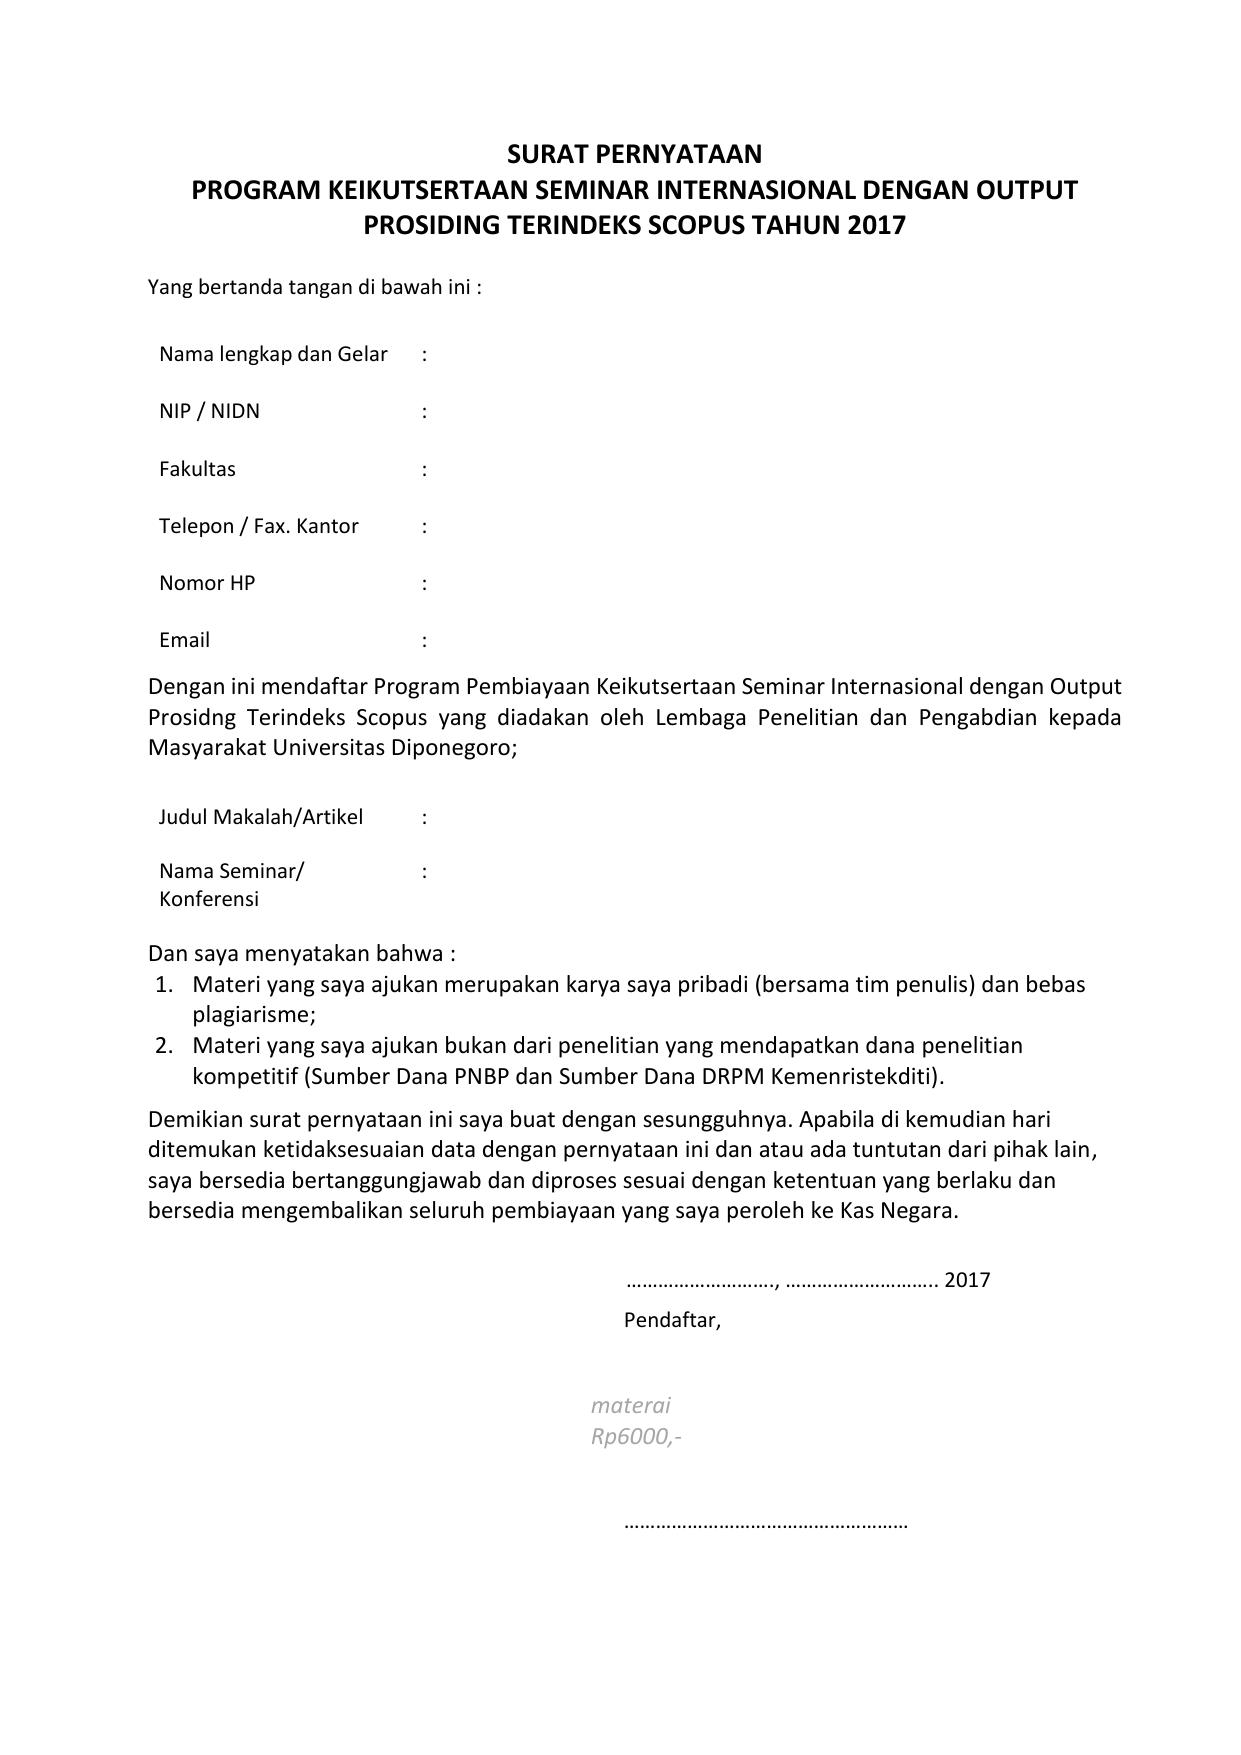 Contoh Surat Pernyataan Program Keikutsertaan